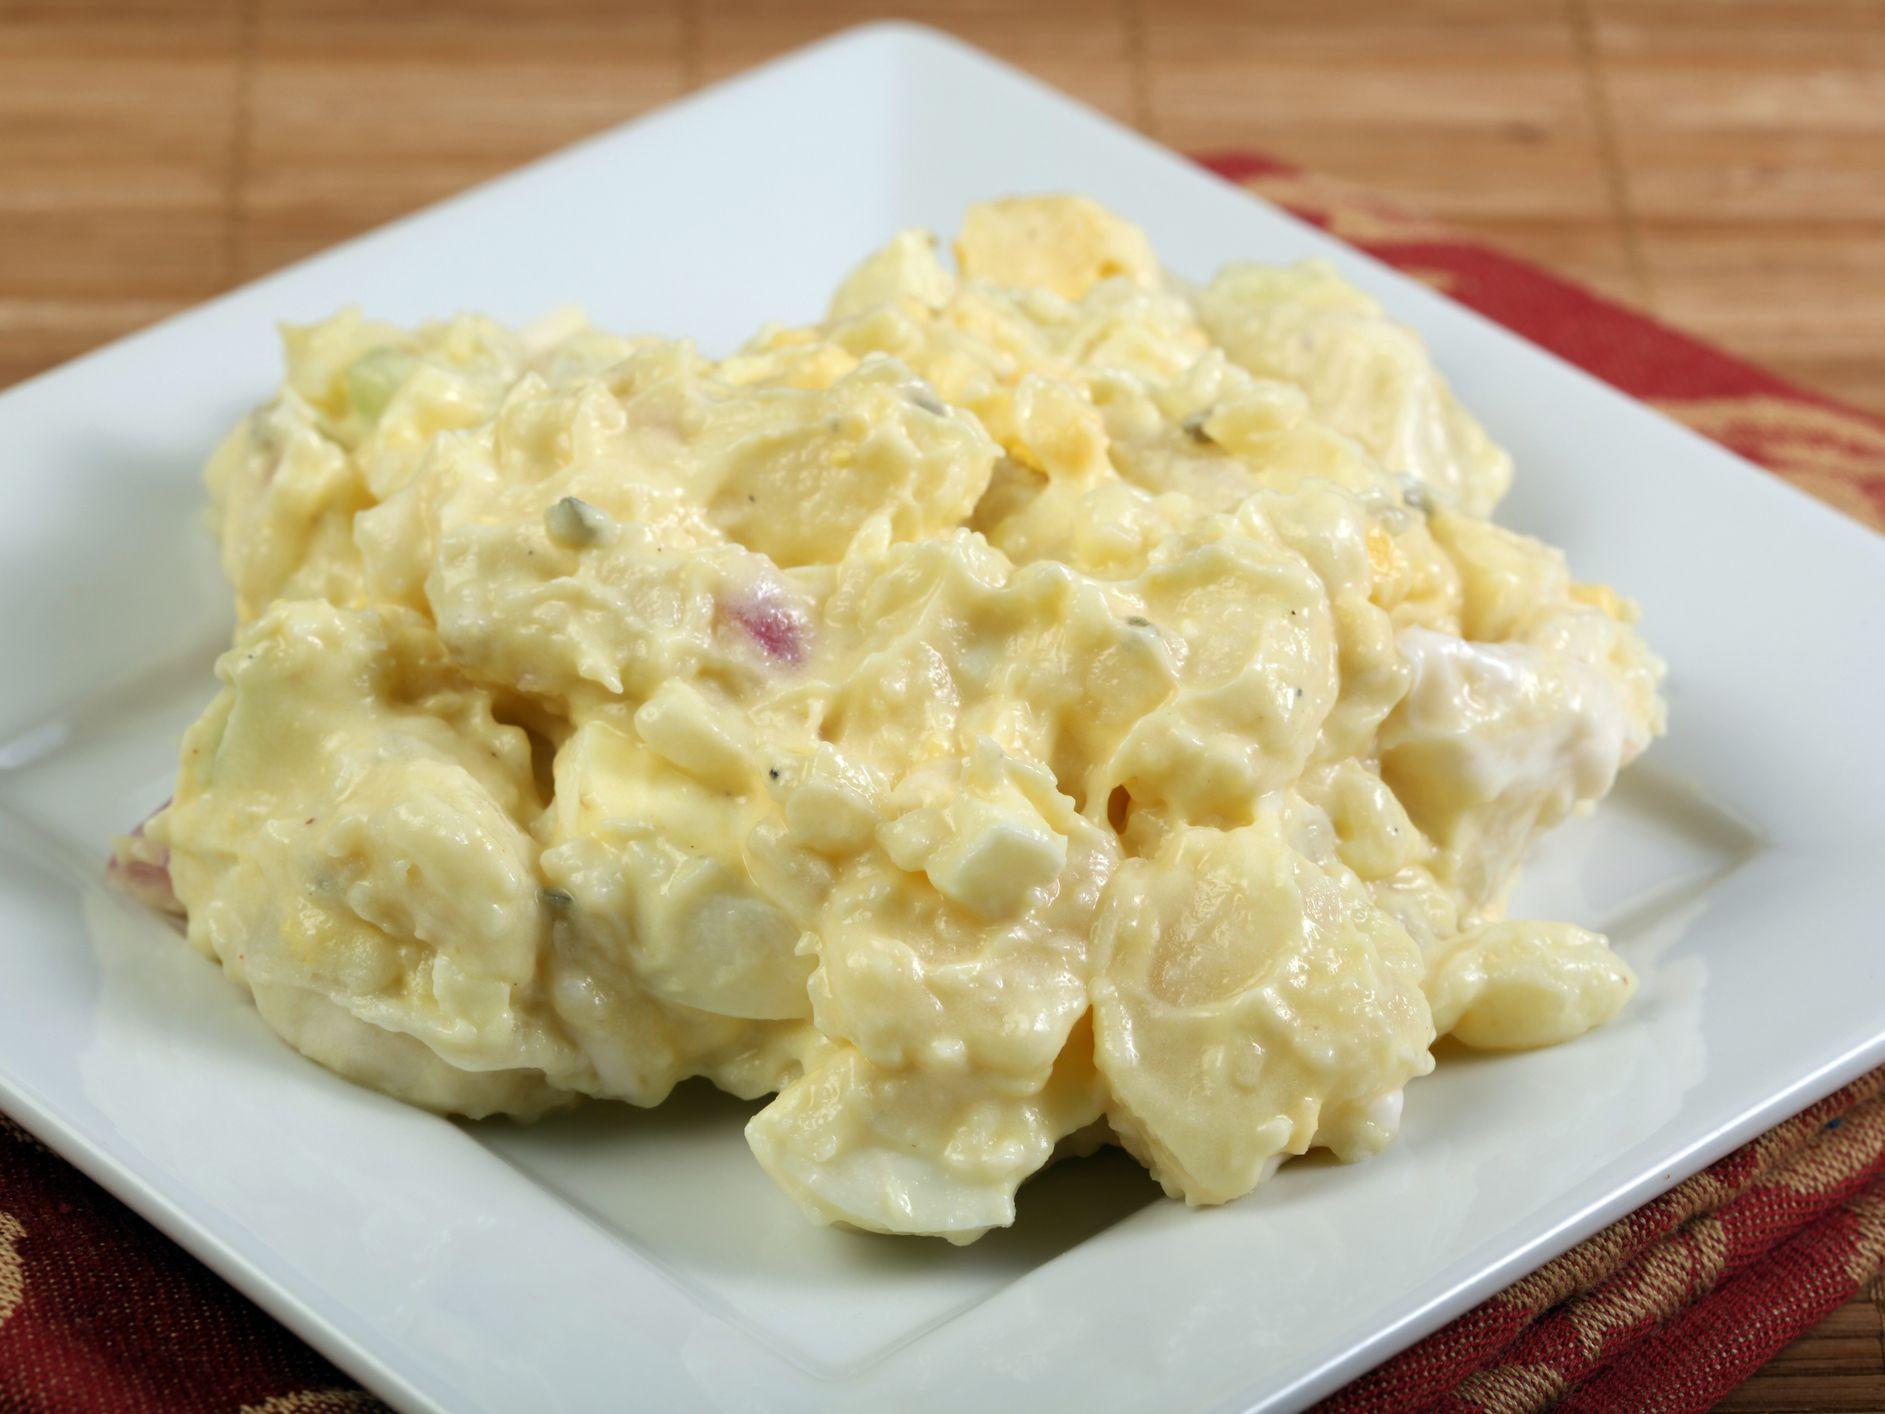 Potato Salad Recipe Using Red Potatoes